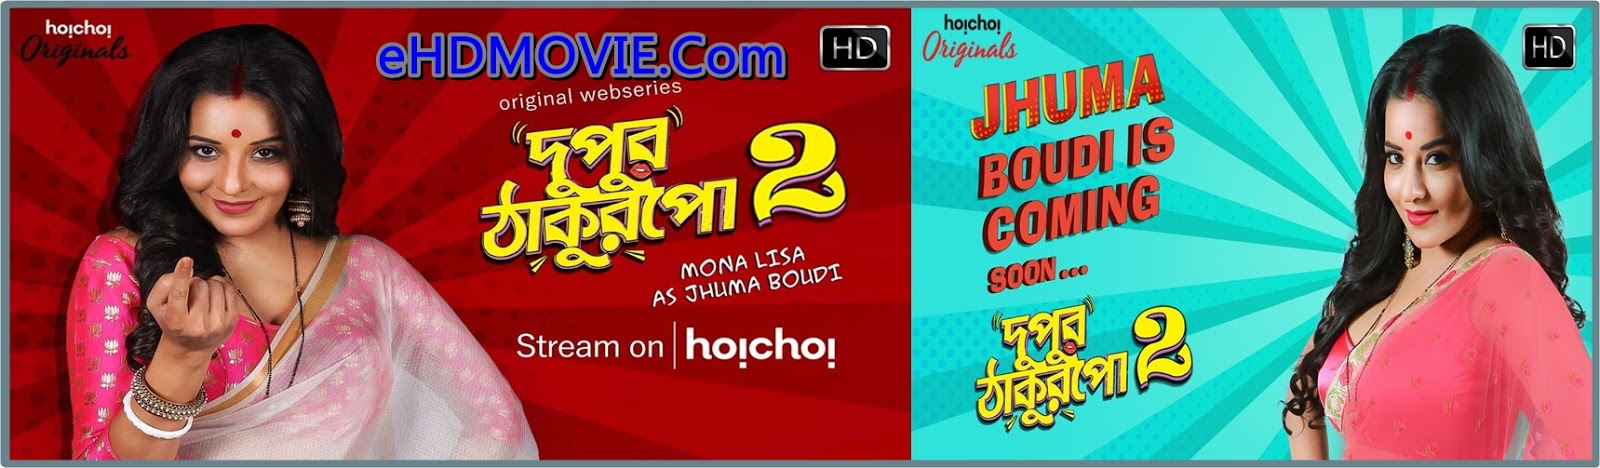 Dupur Thakurpo S02 2018 Bengali Web Series All Episode Original 480p - 720p ORG WEB-DL 450MB - 1.1GB